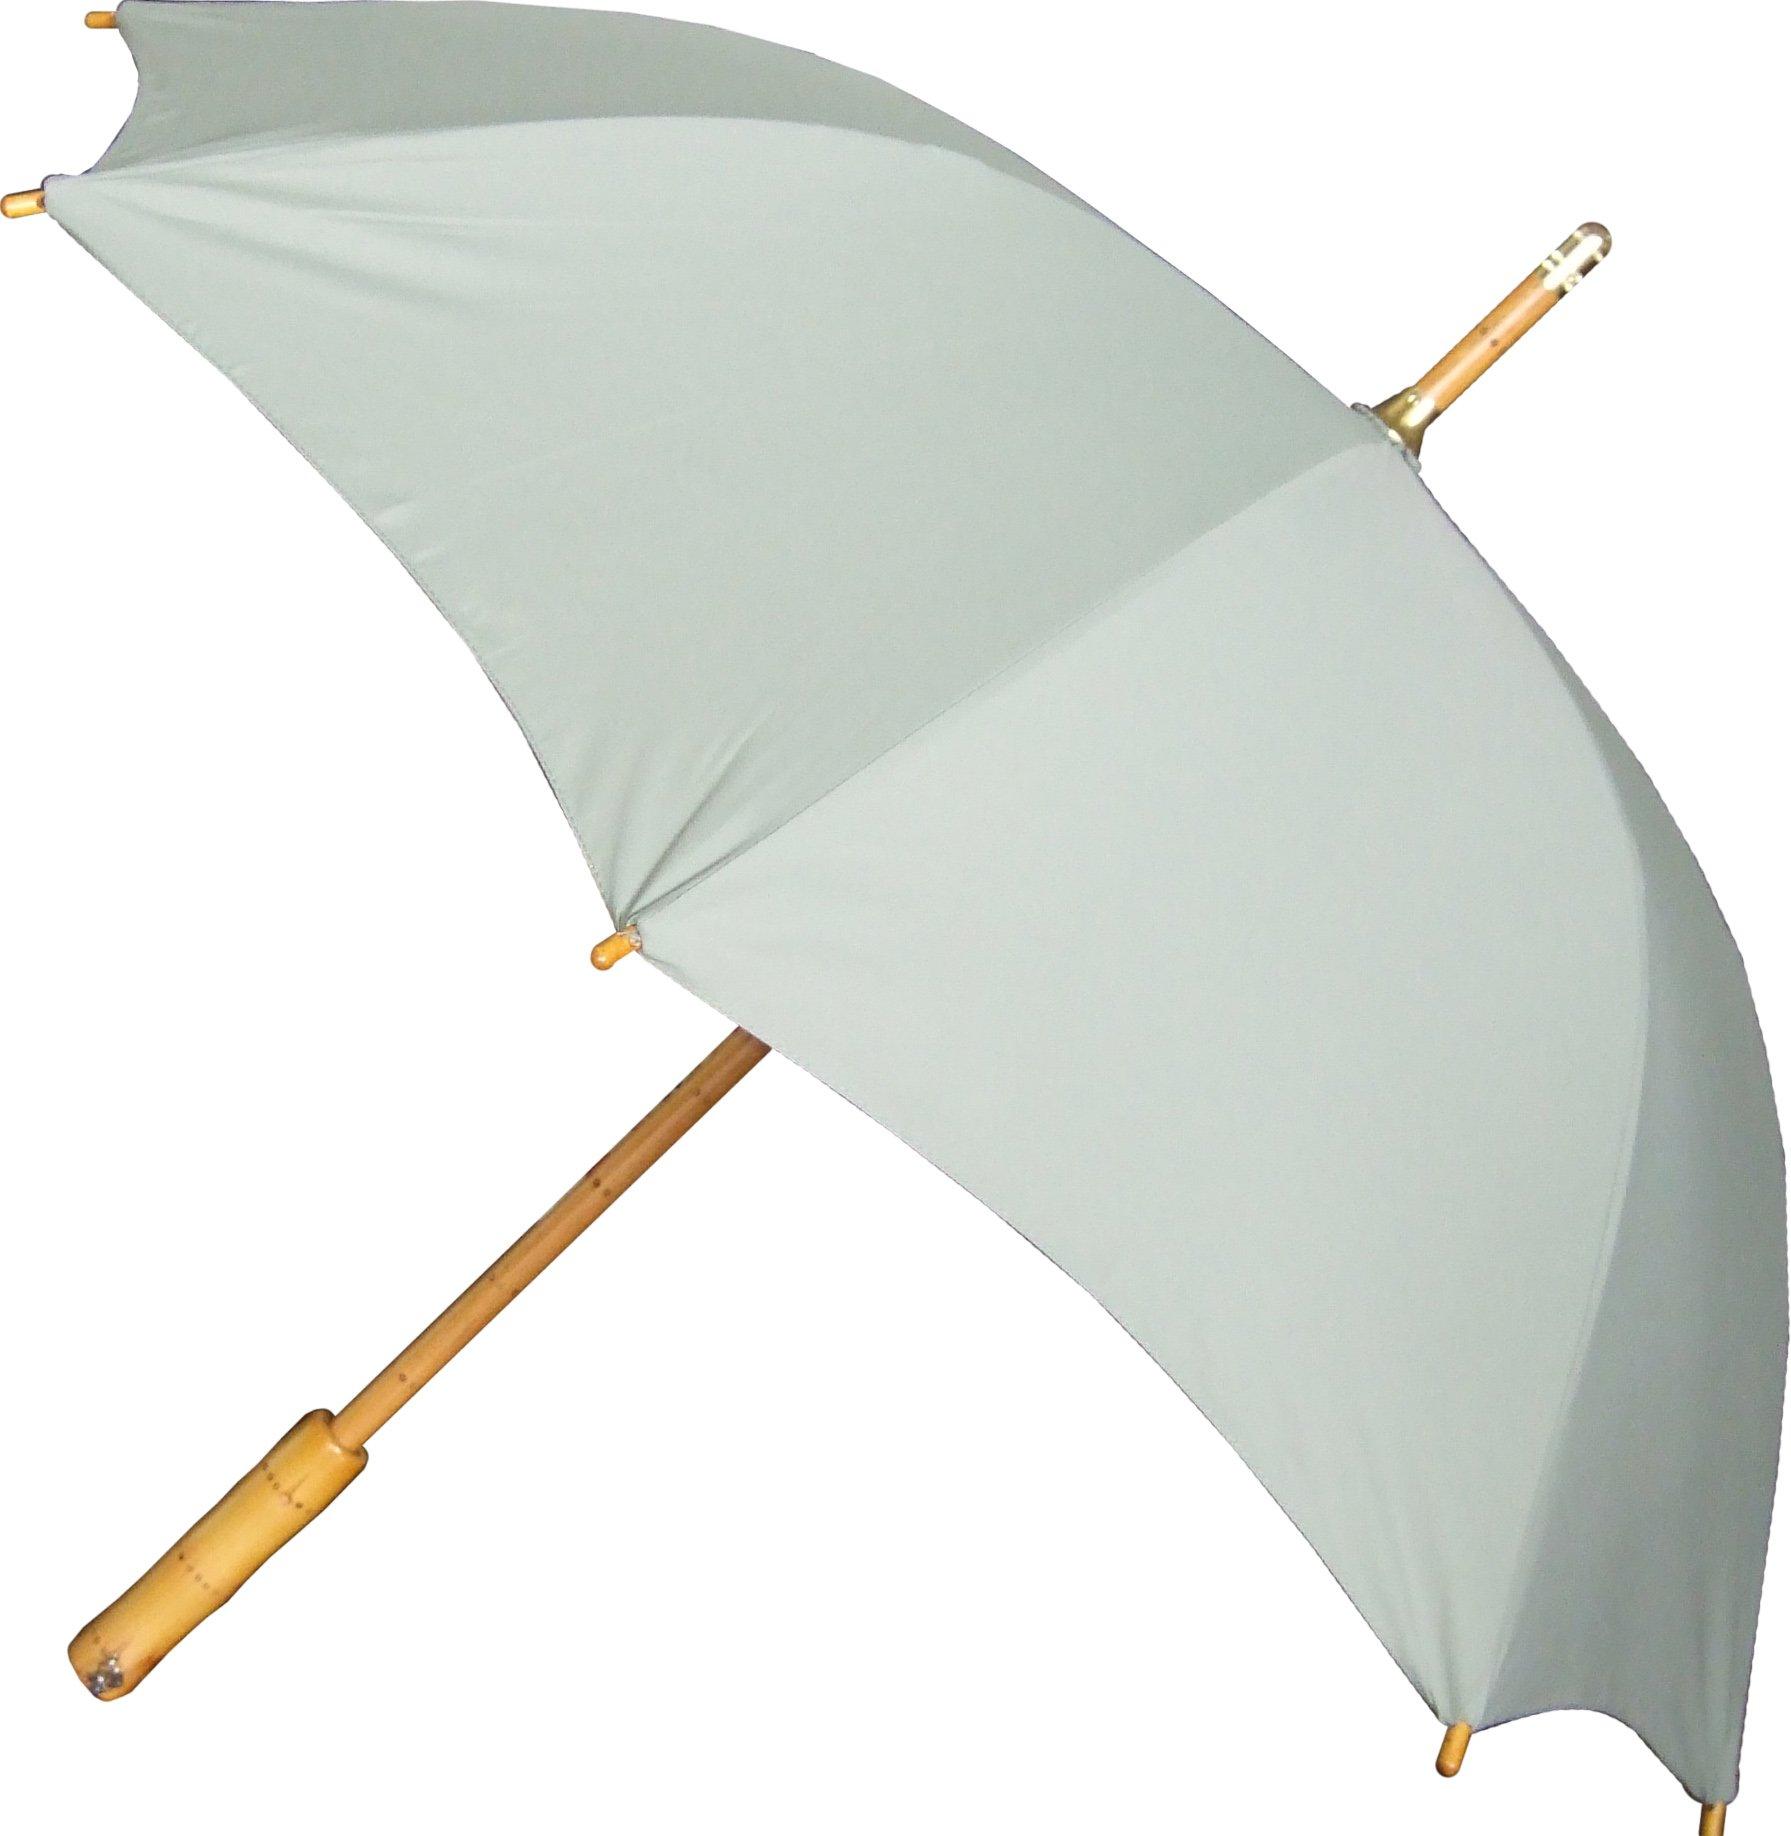 Umbrellas Hawaii Sun Protection UPF 50+ by Umbrellas Hawaii (Image #2)